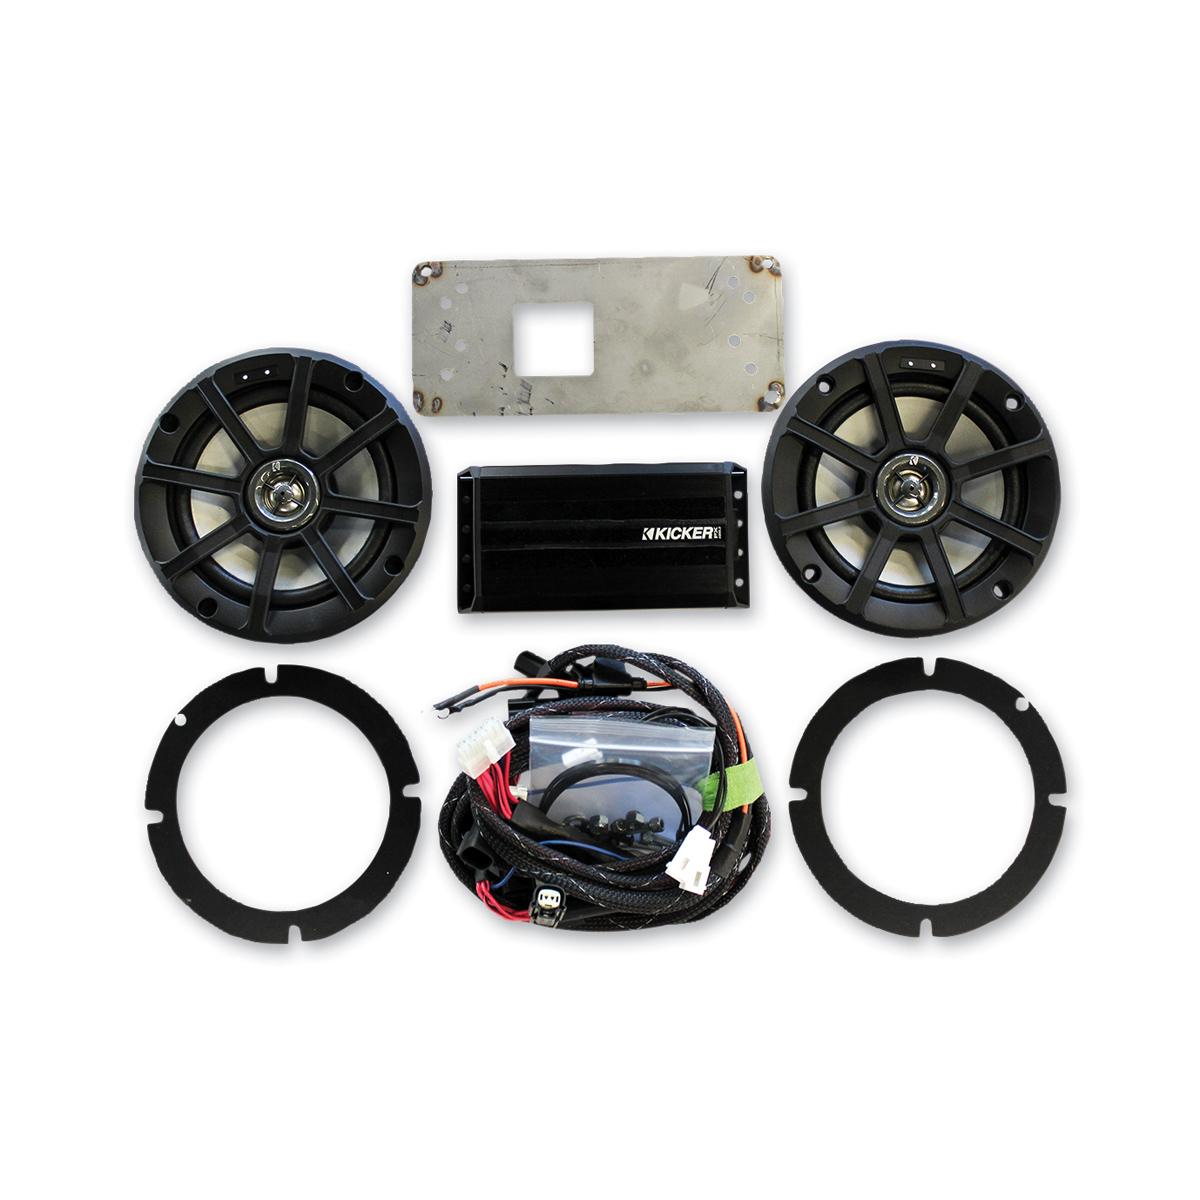 Klock Werks 6-1/2″ Audio Fit Kits Powered by KICKER